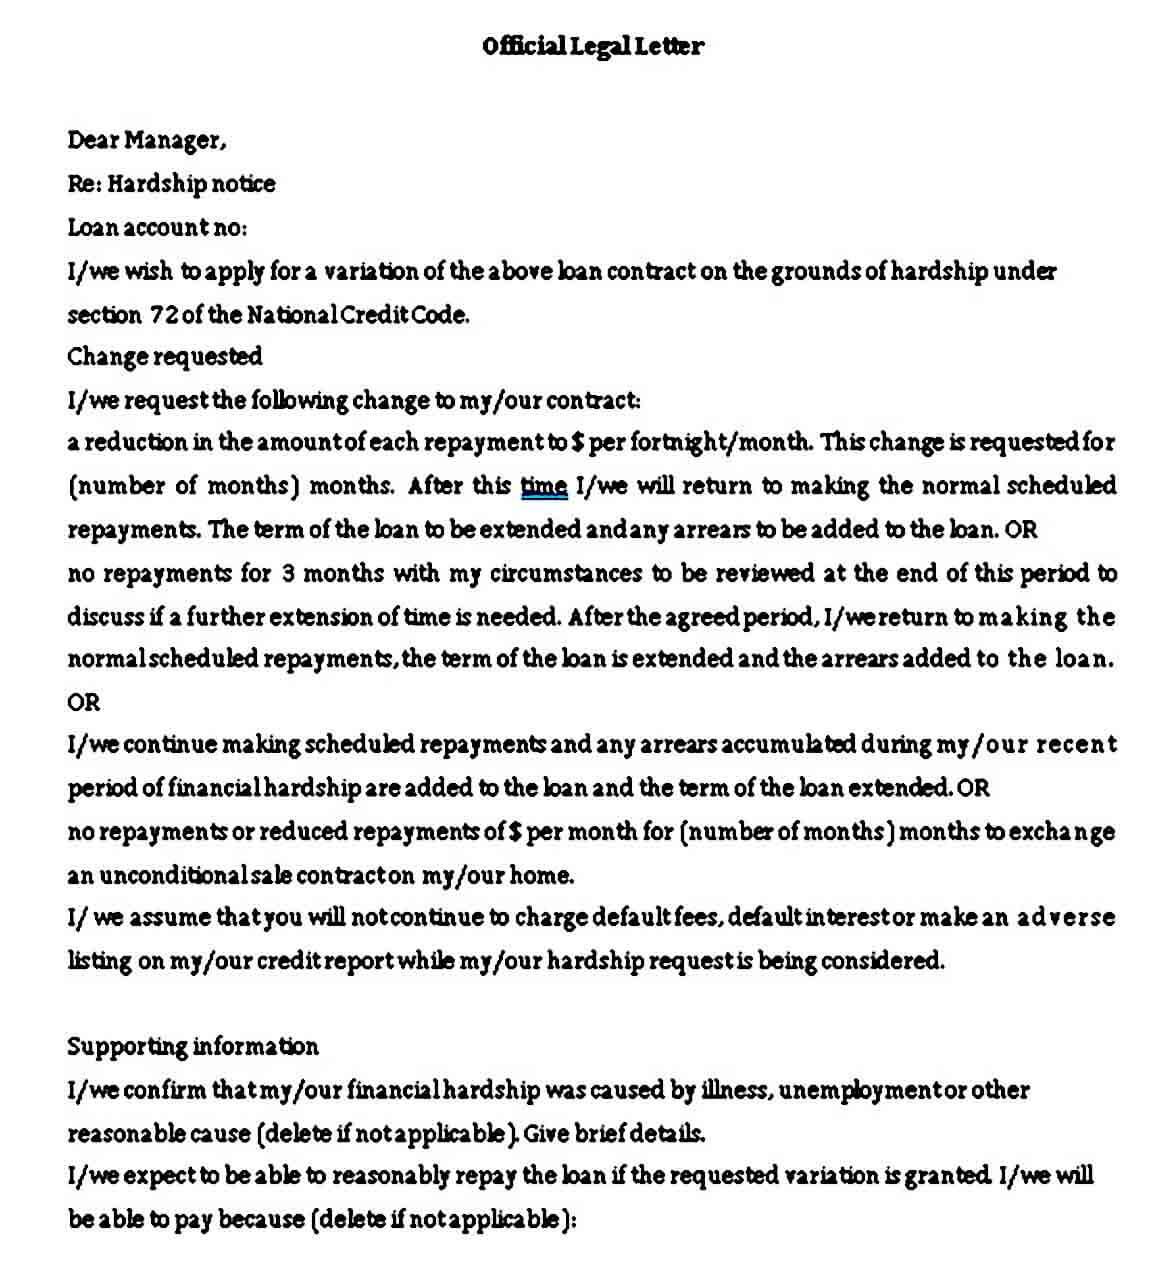 Official Legal Letter Format